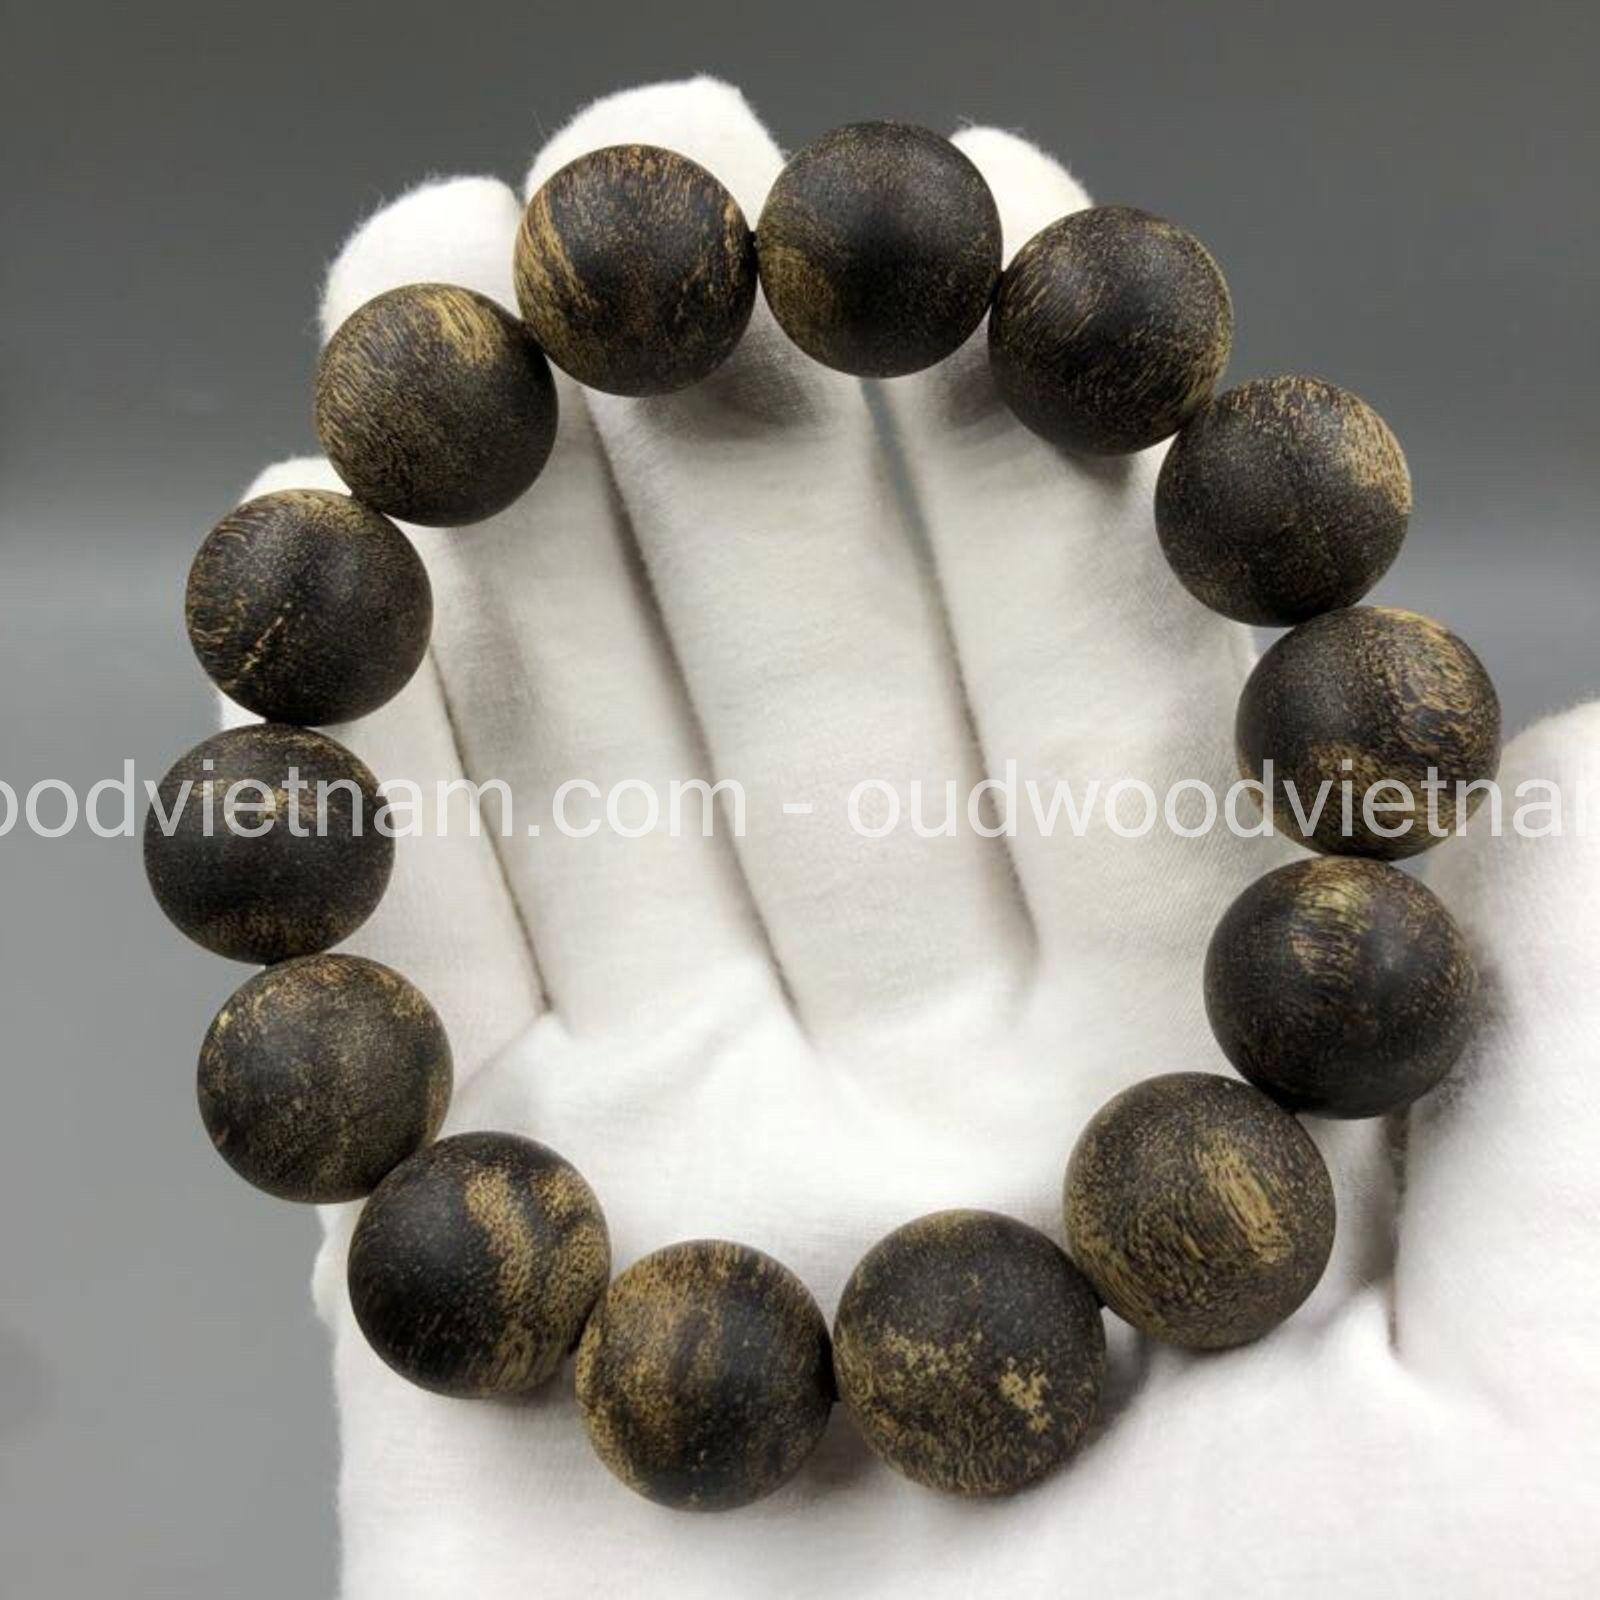 Sale for Begin Open Shop VietNam Agarwood bracelets